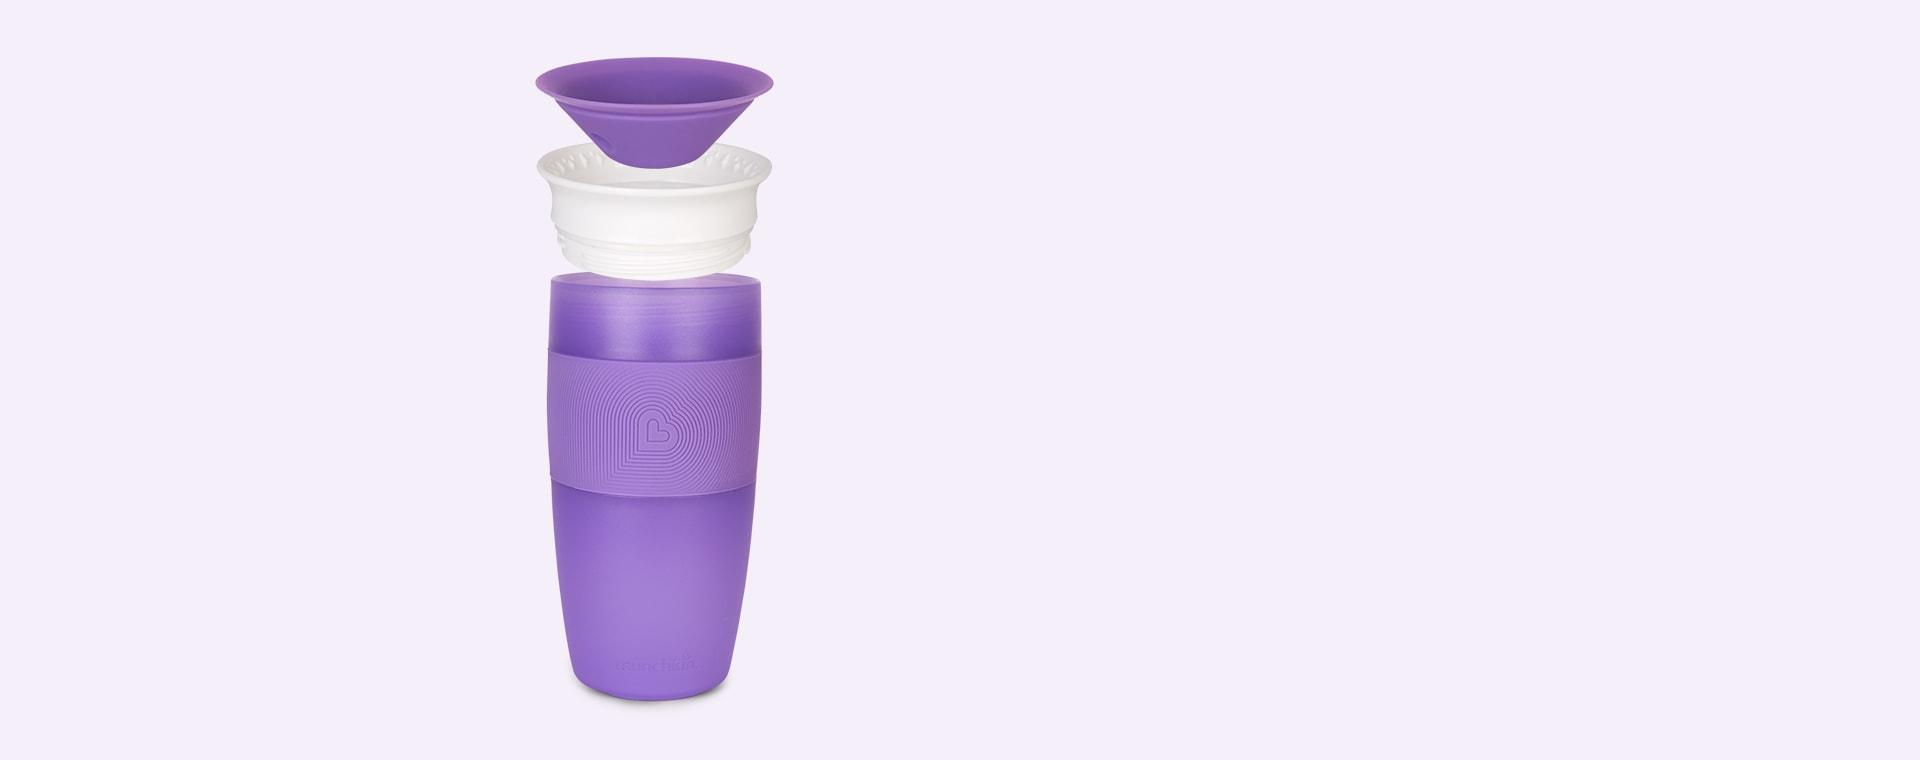 Purple Munchkin Miracle 360 Cup 14oz